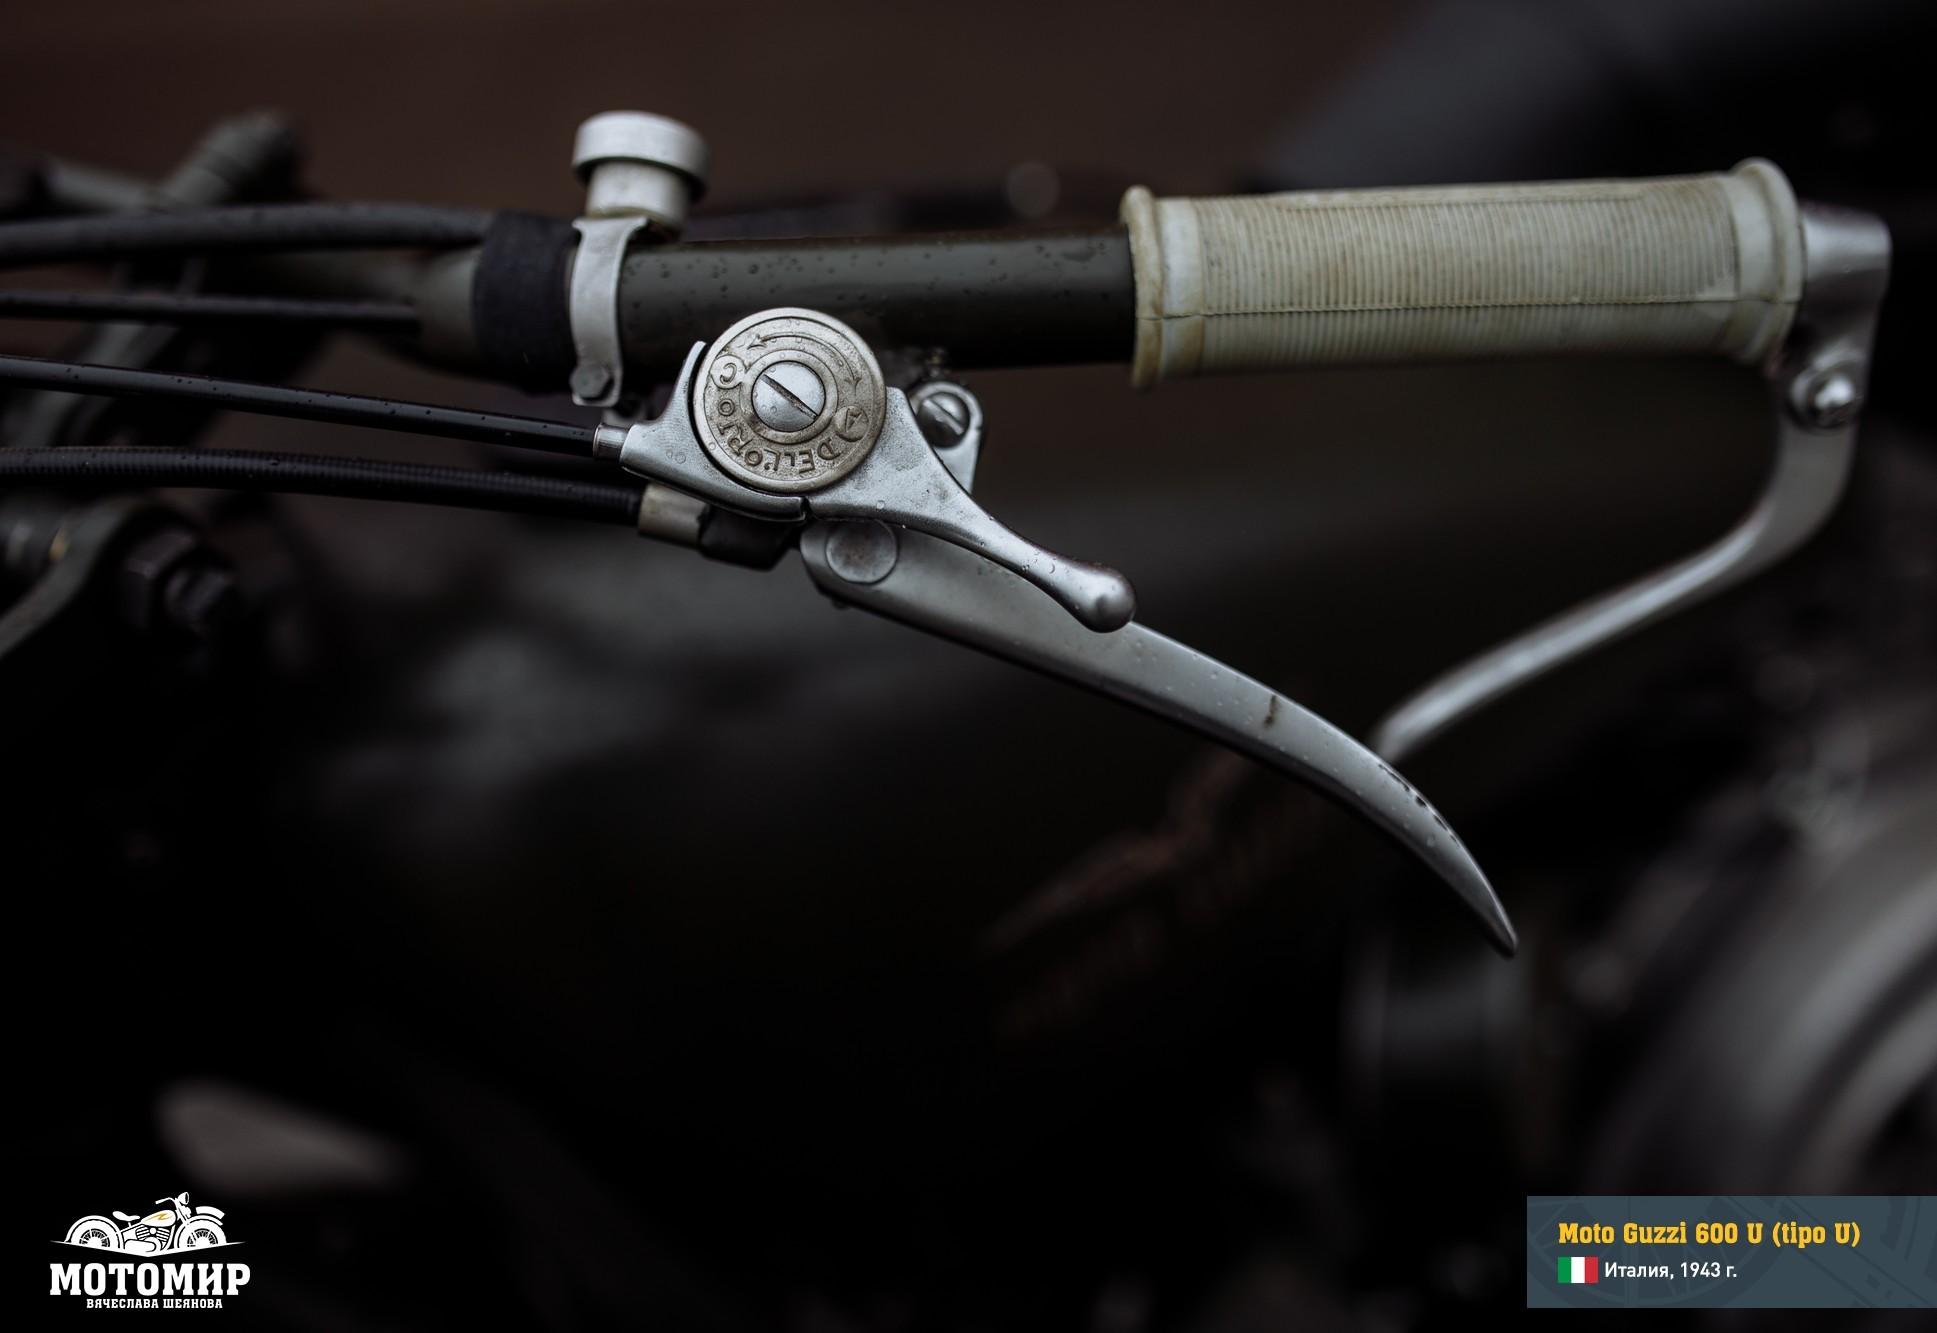 moto-guzzi-600-u-web-48